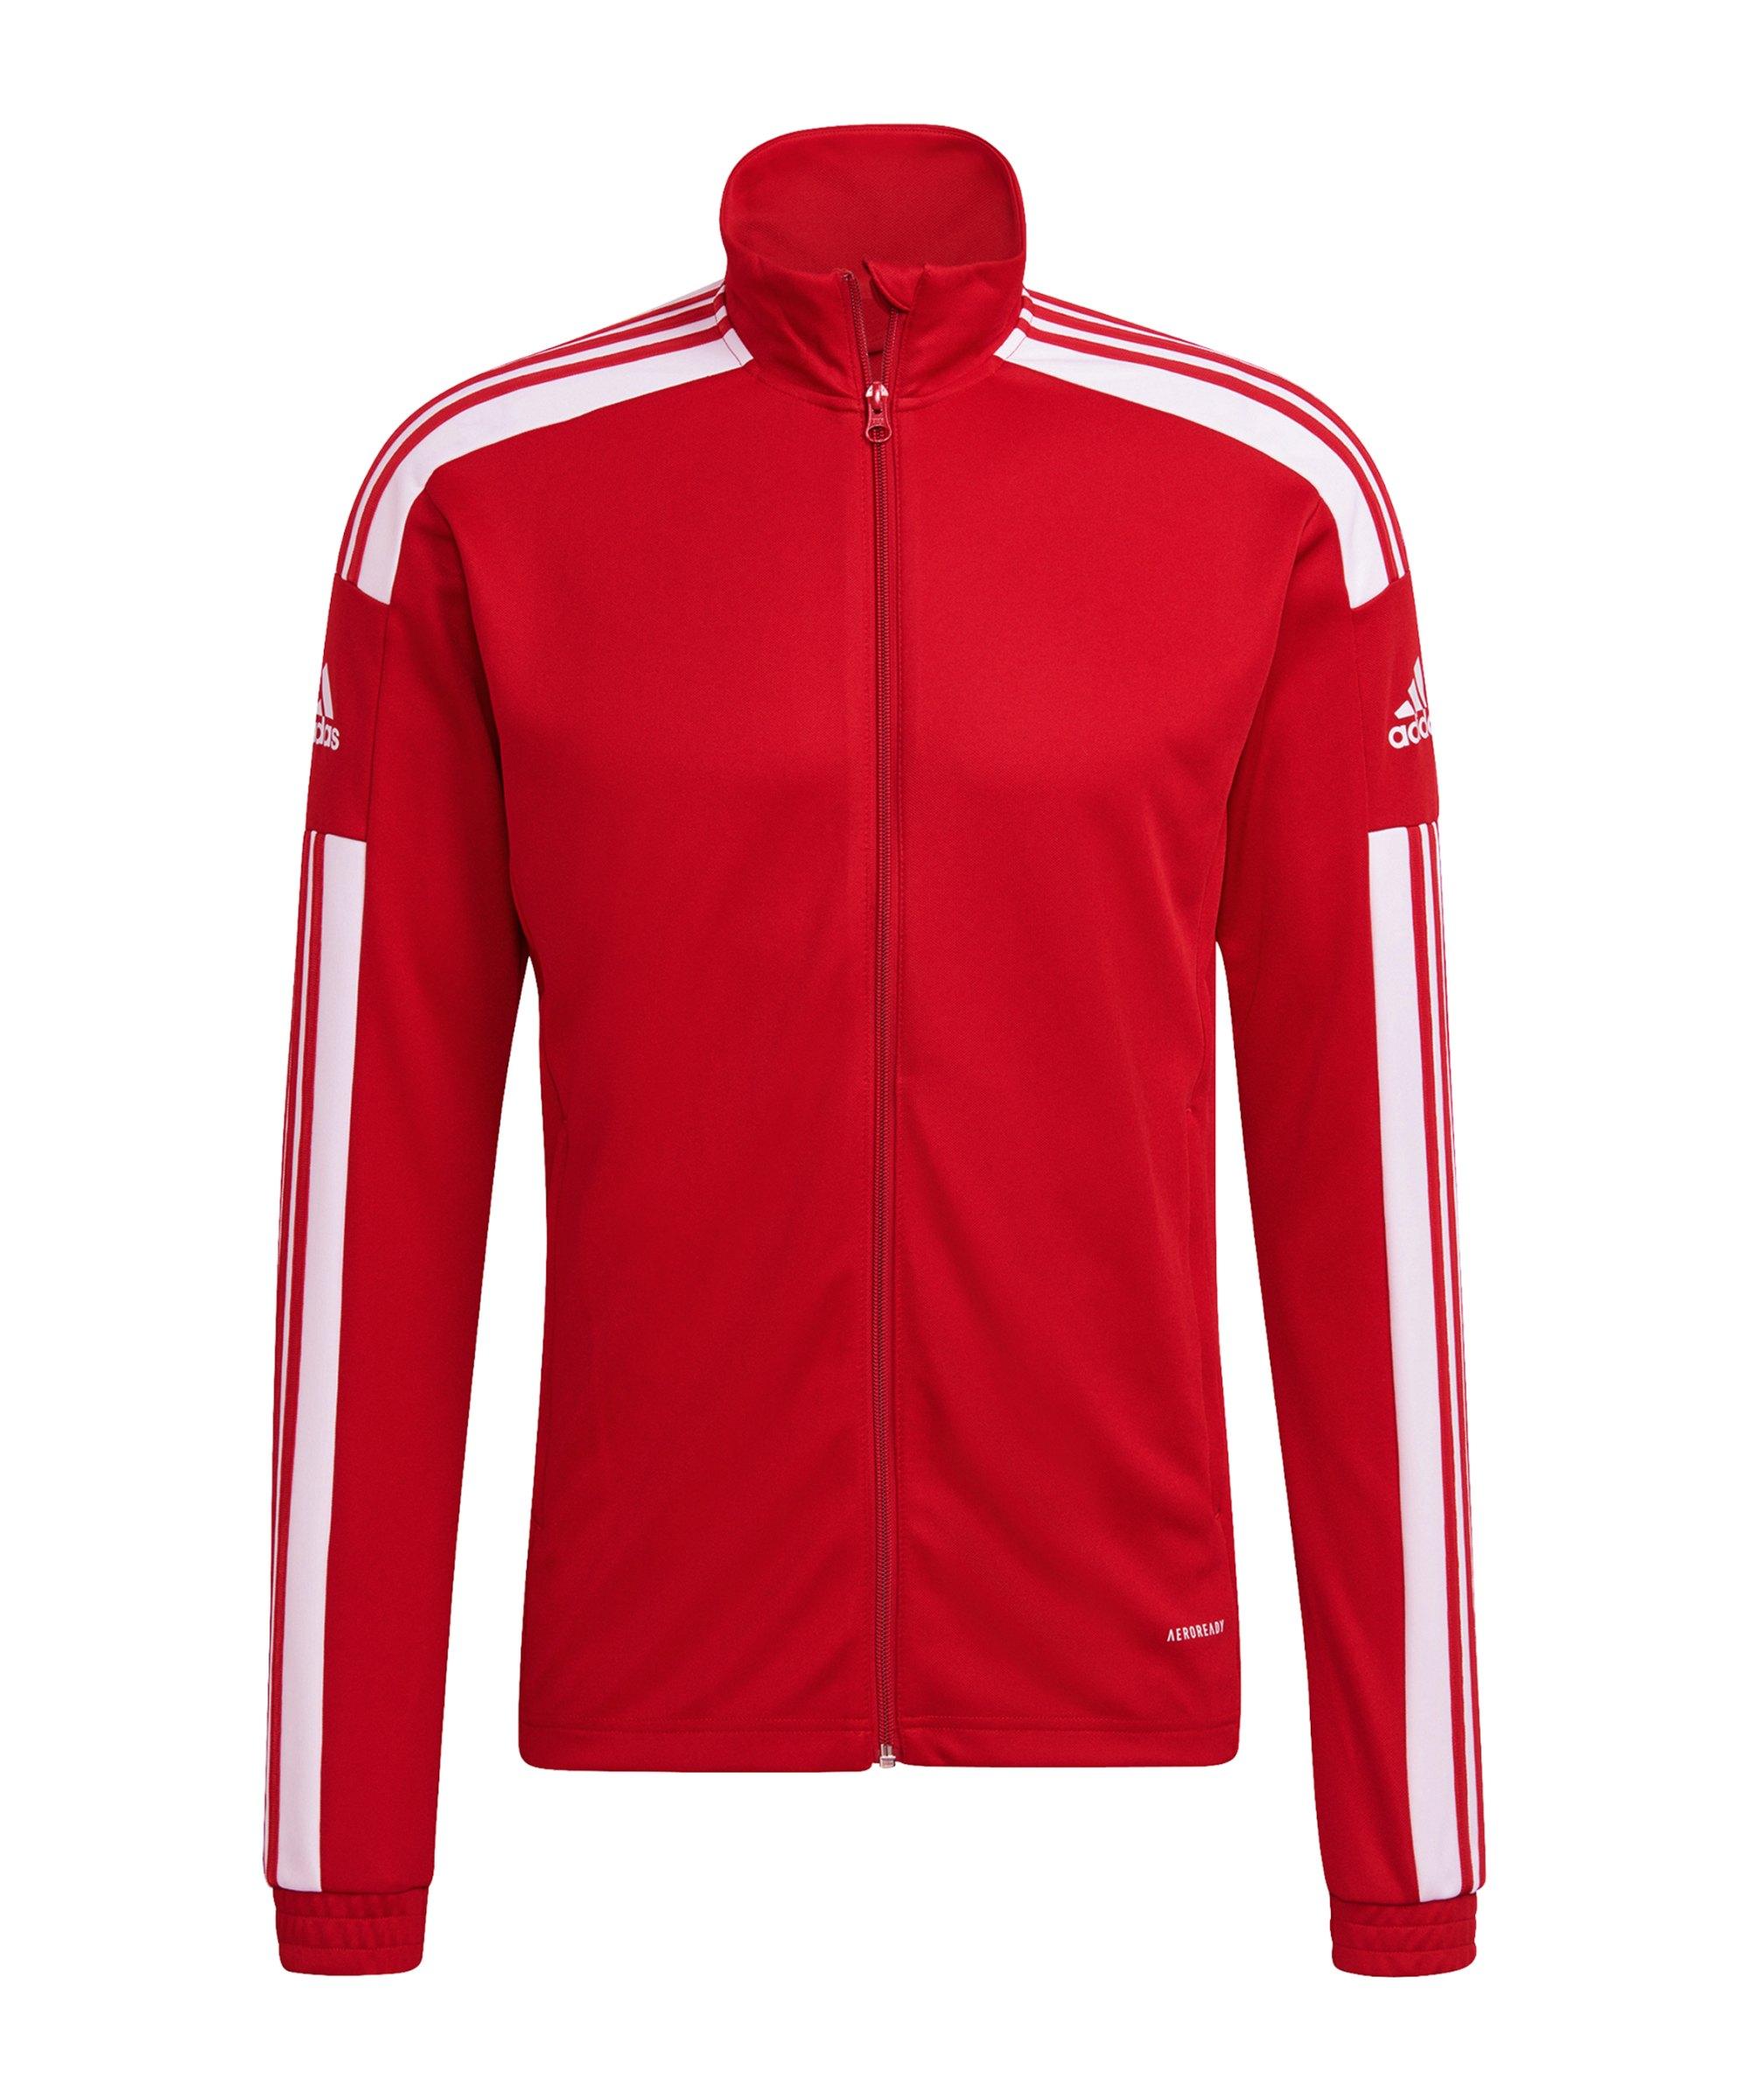 adidas Squadra 21 Trainingsjacke Rot Weiss - rot